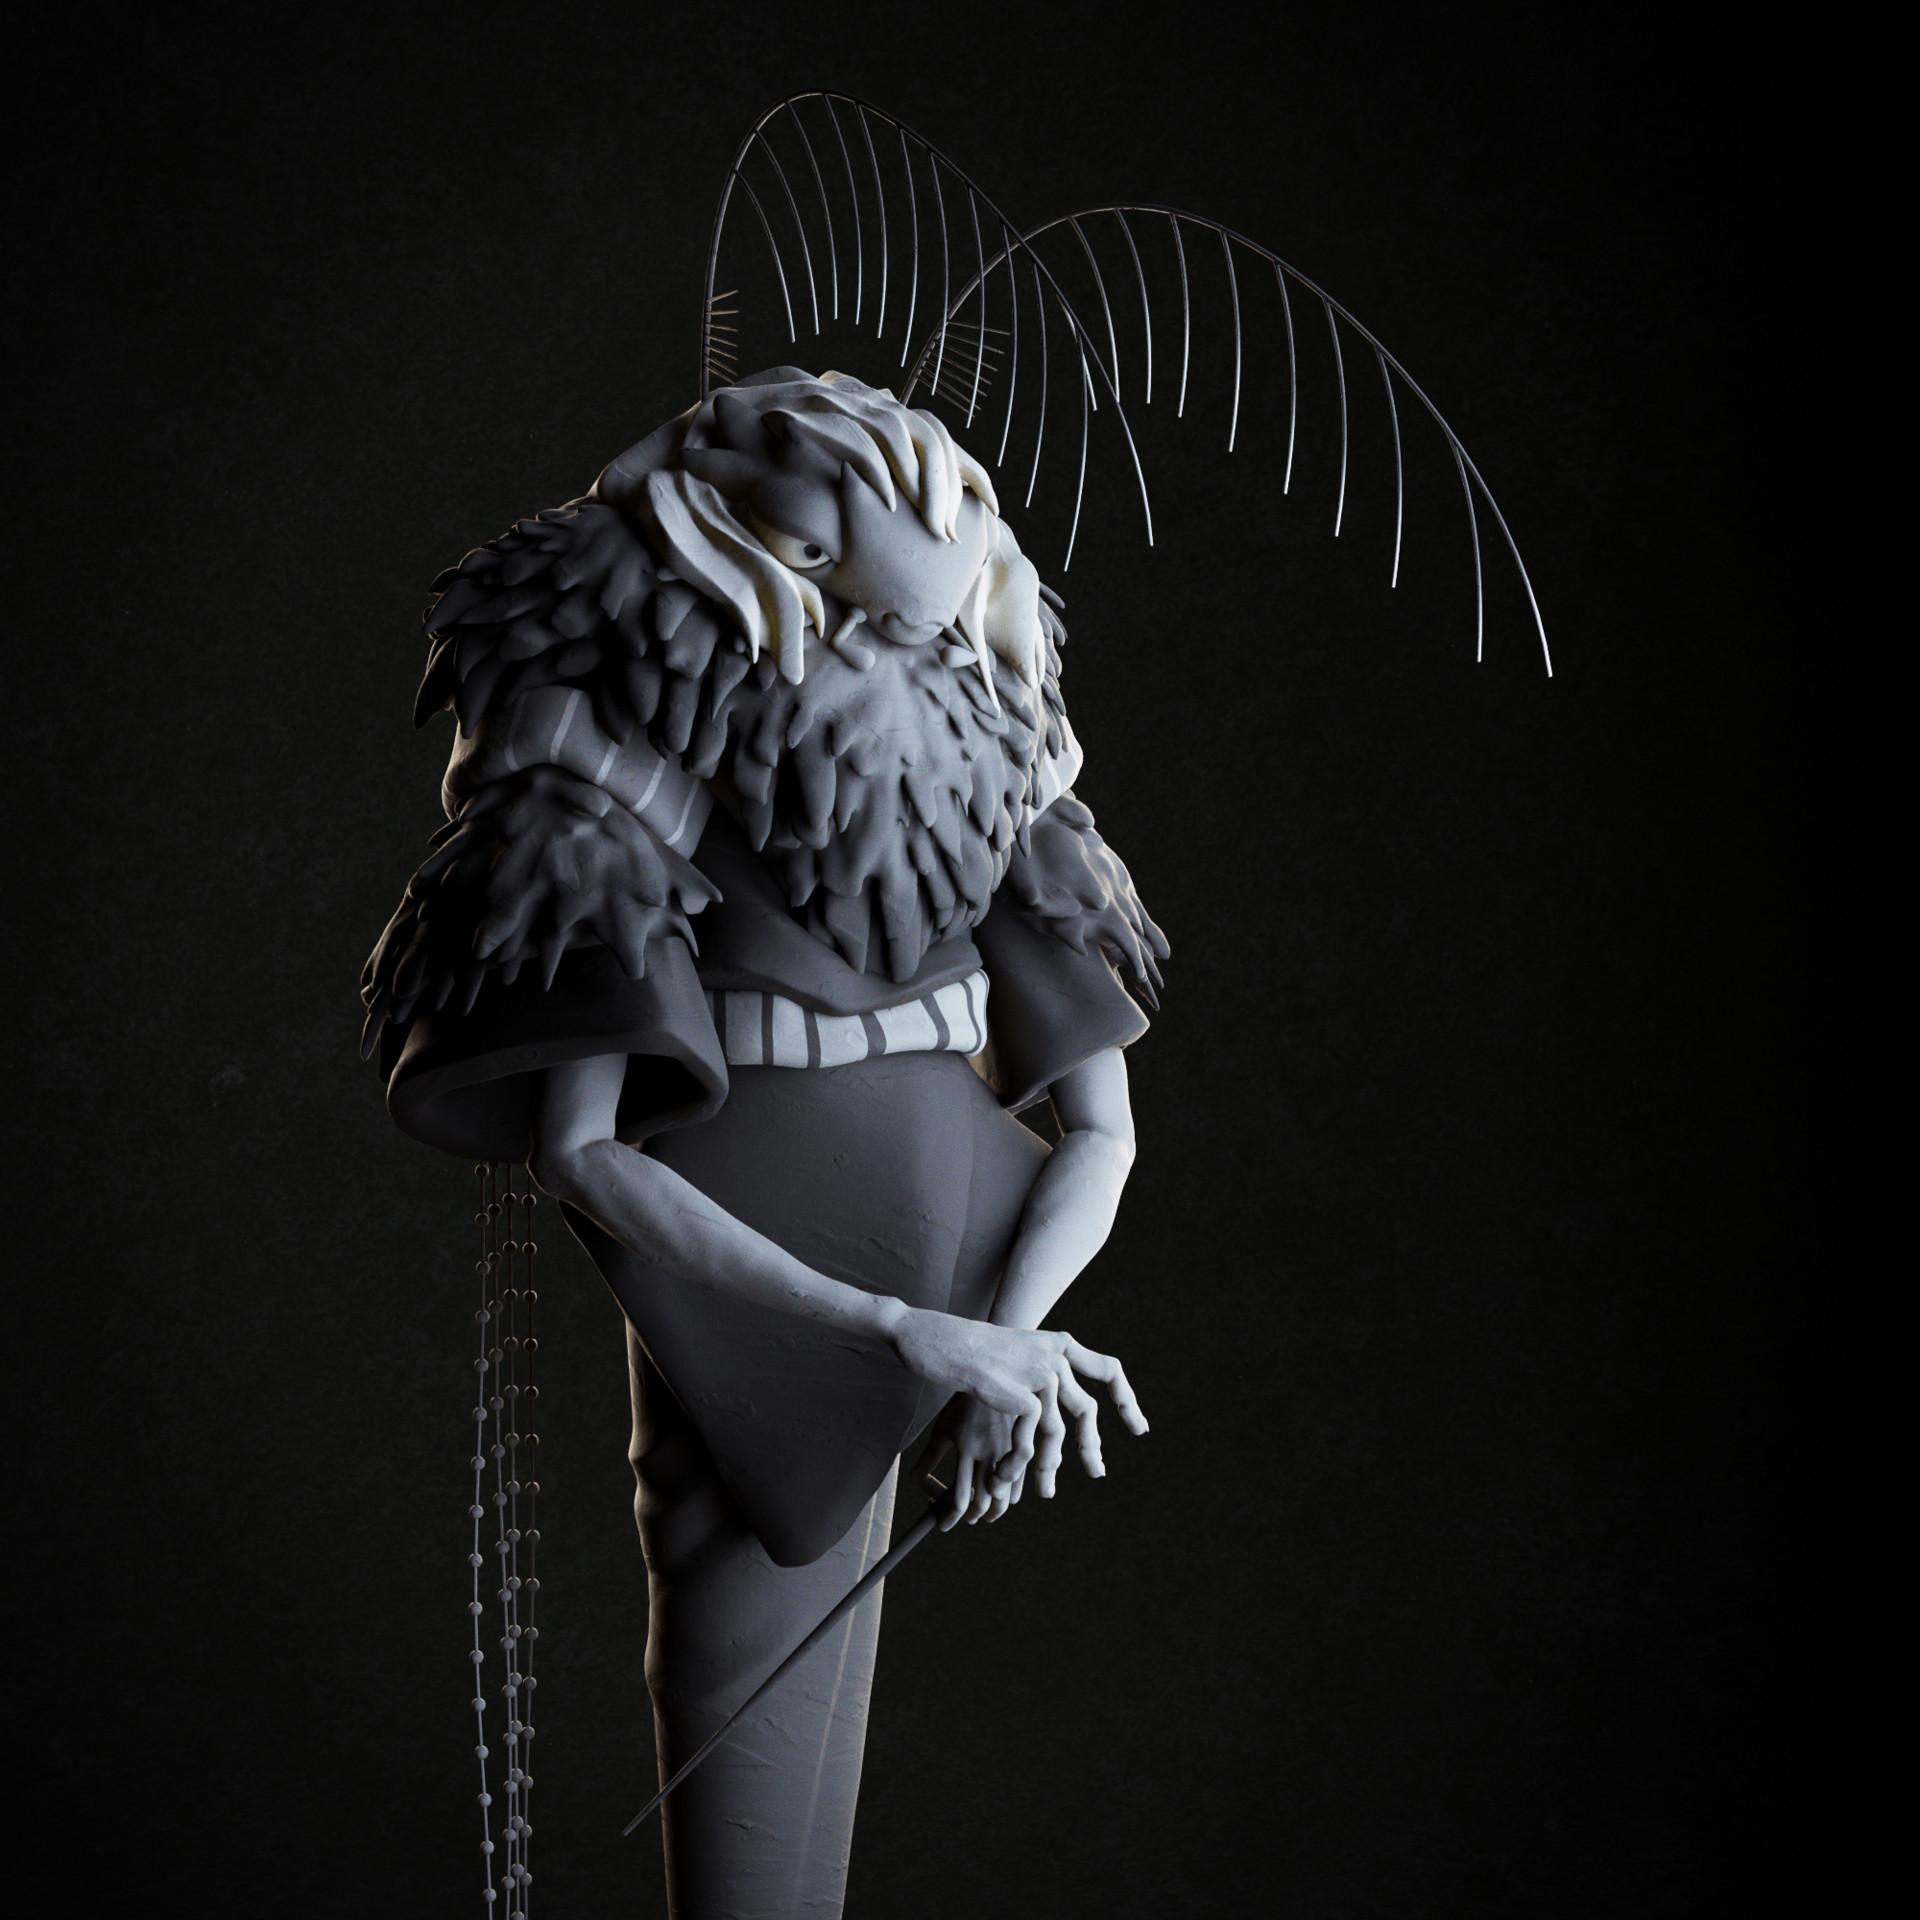 Day 14: Magic (based on an artwork by Lalanda Hruschka: https://www.artstation.com/artwork/vYOga)